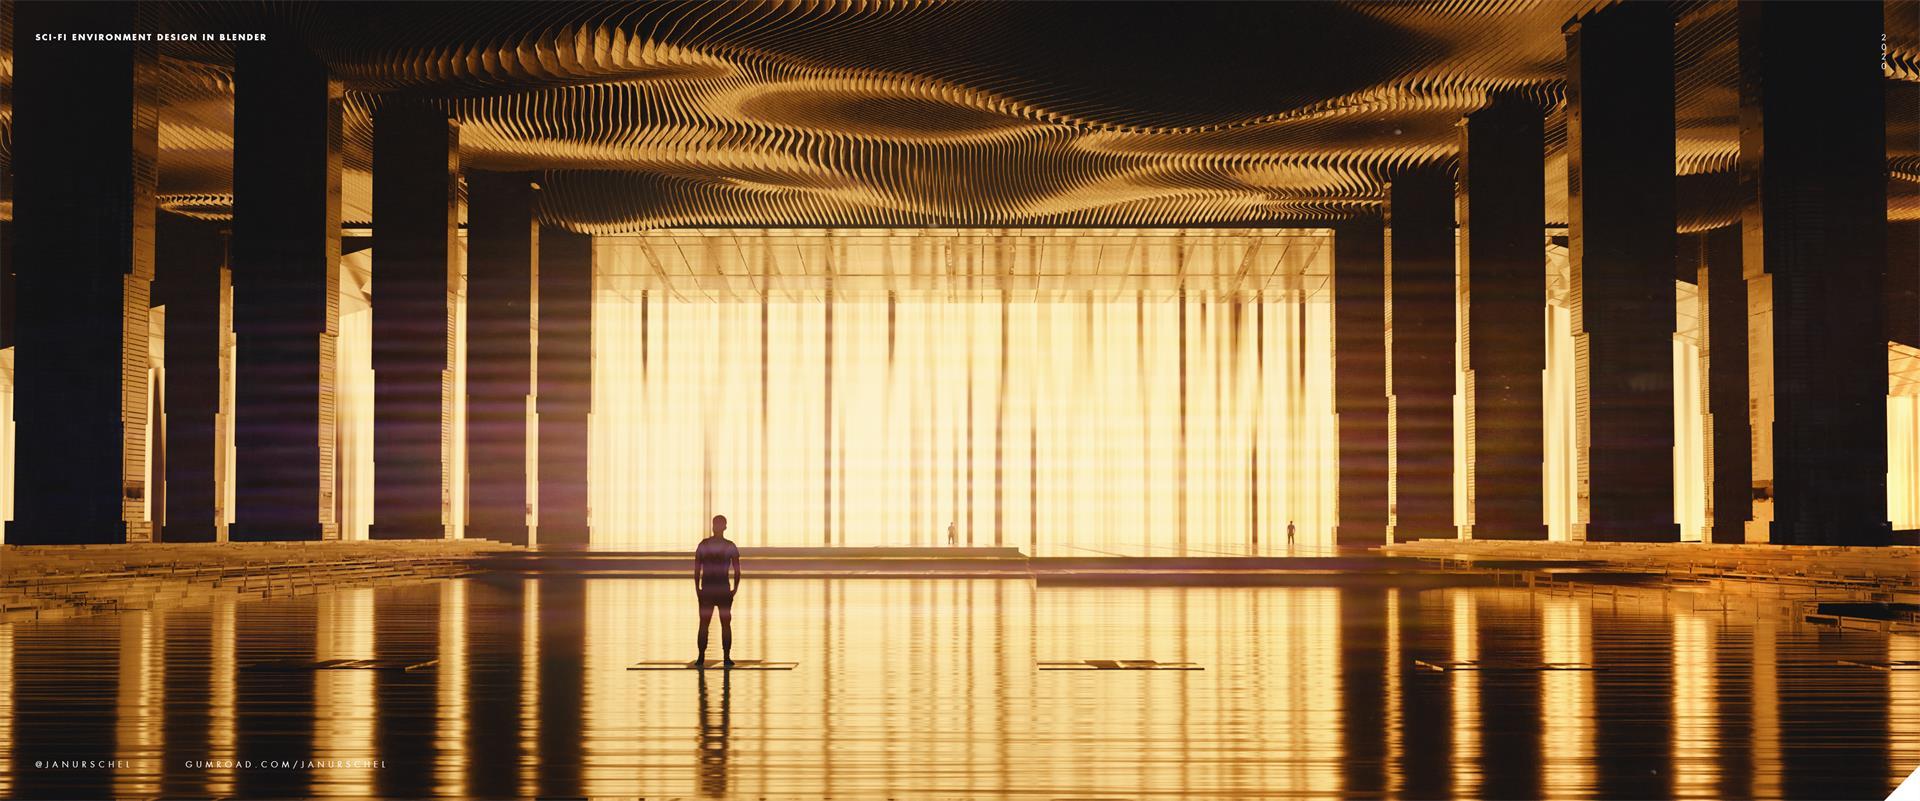 C4素材网-Blender工程-建筑科幻场景